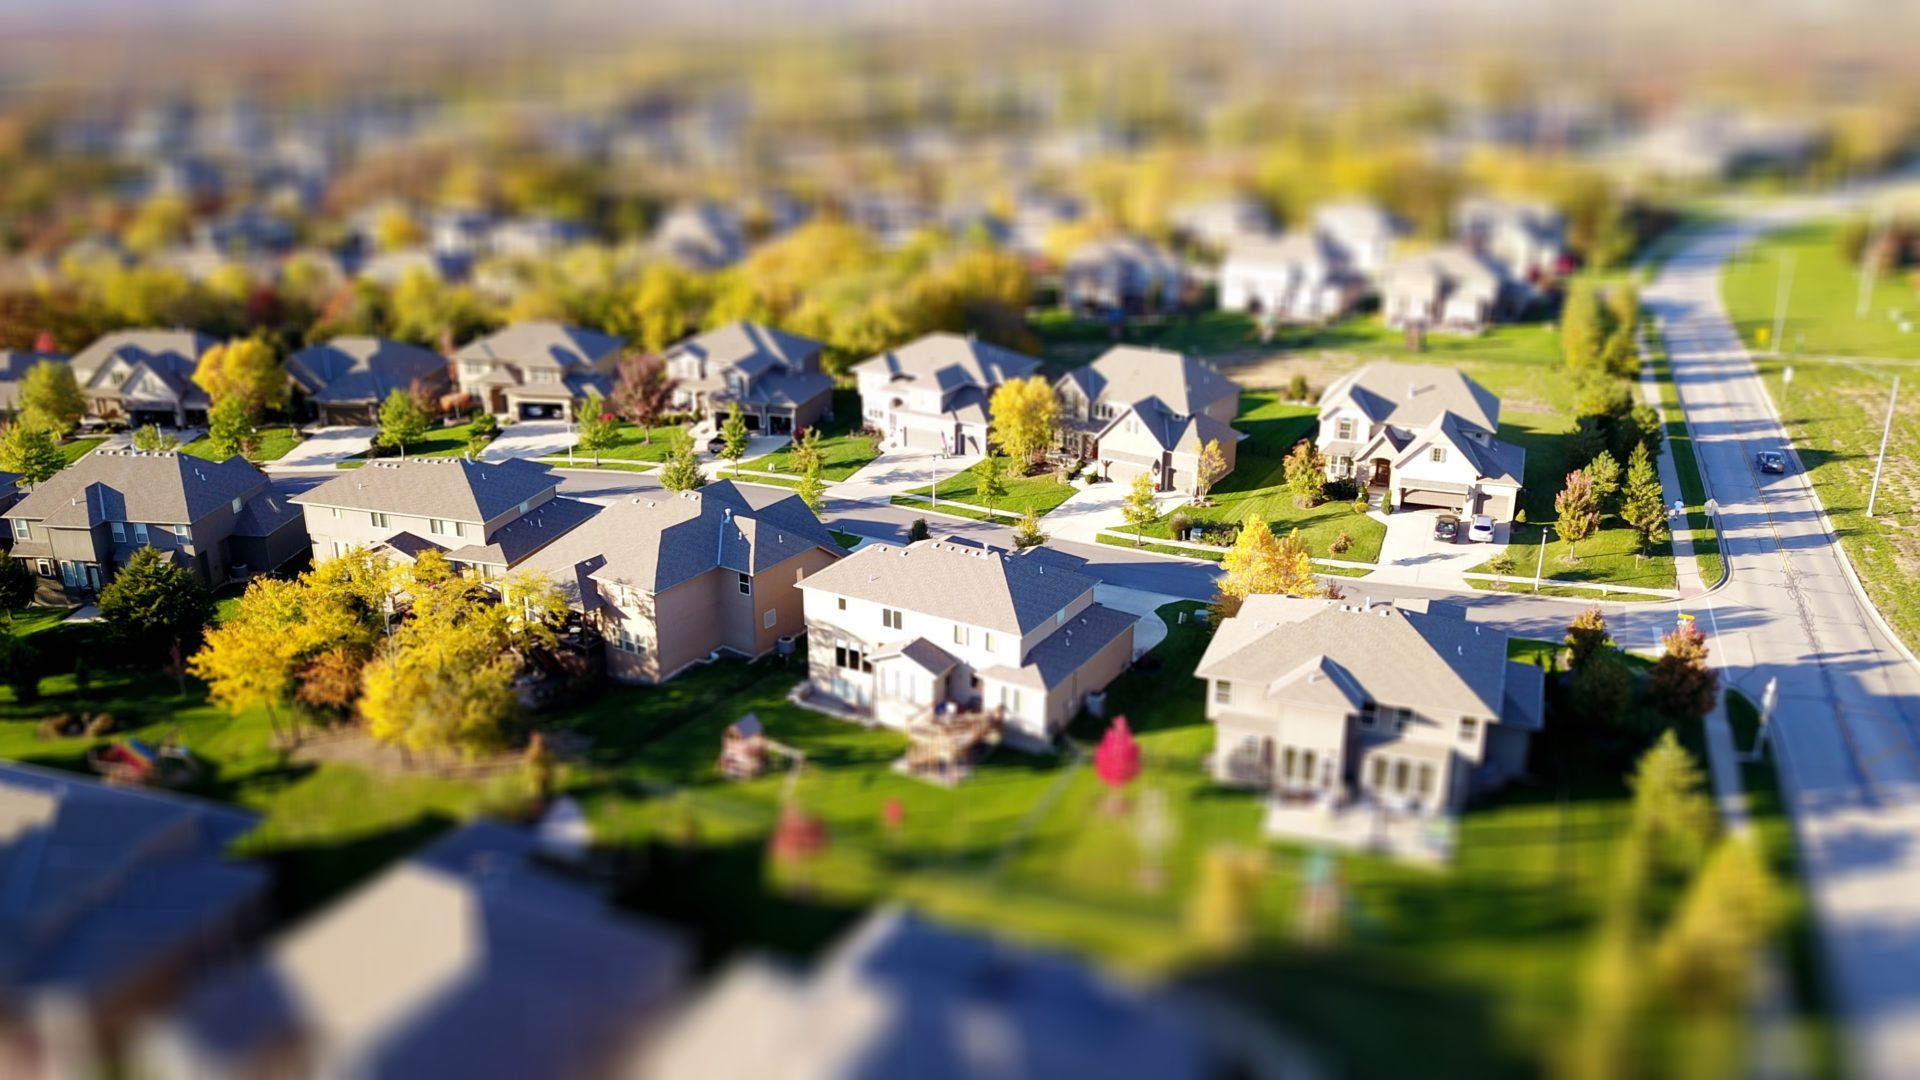 lommelse hypotheken en energie